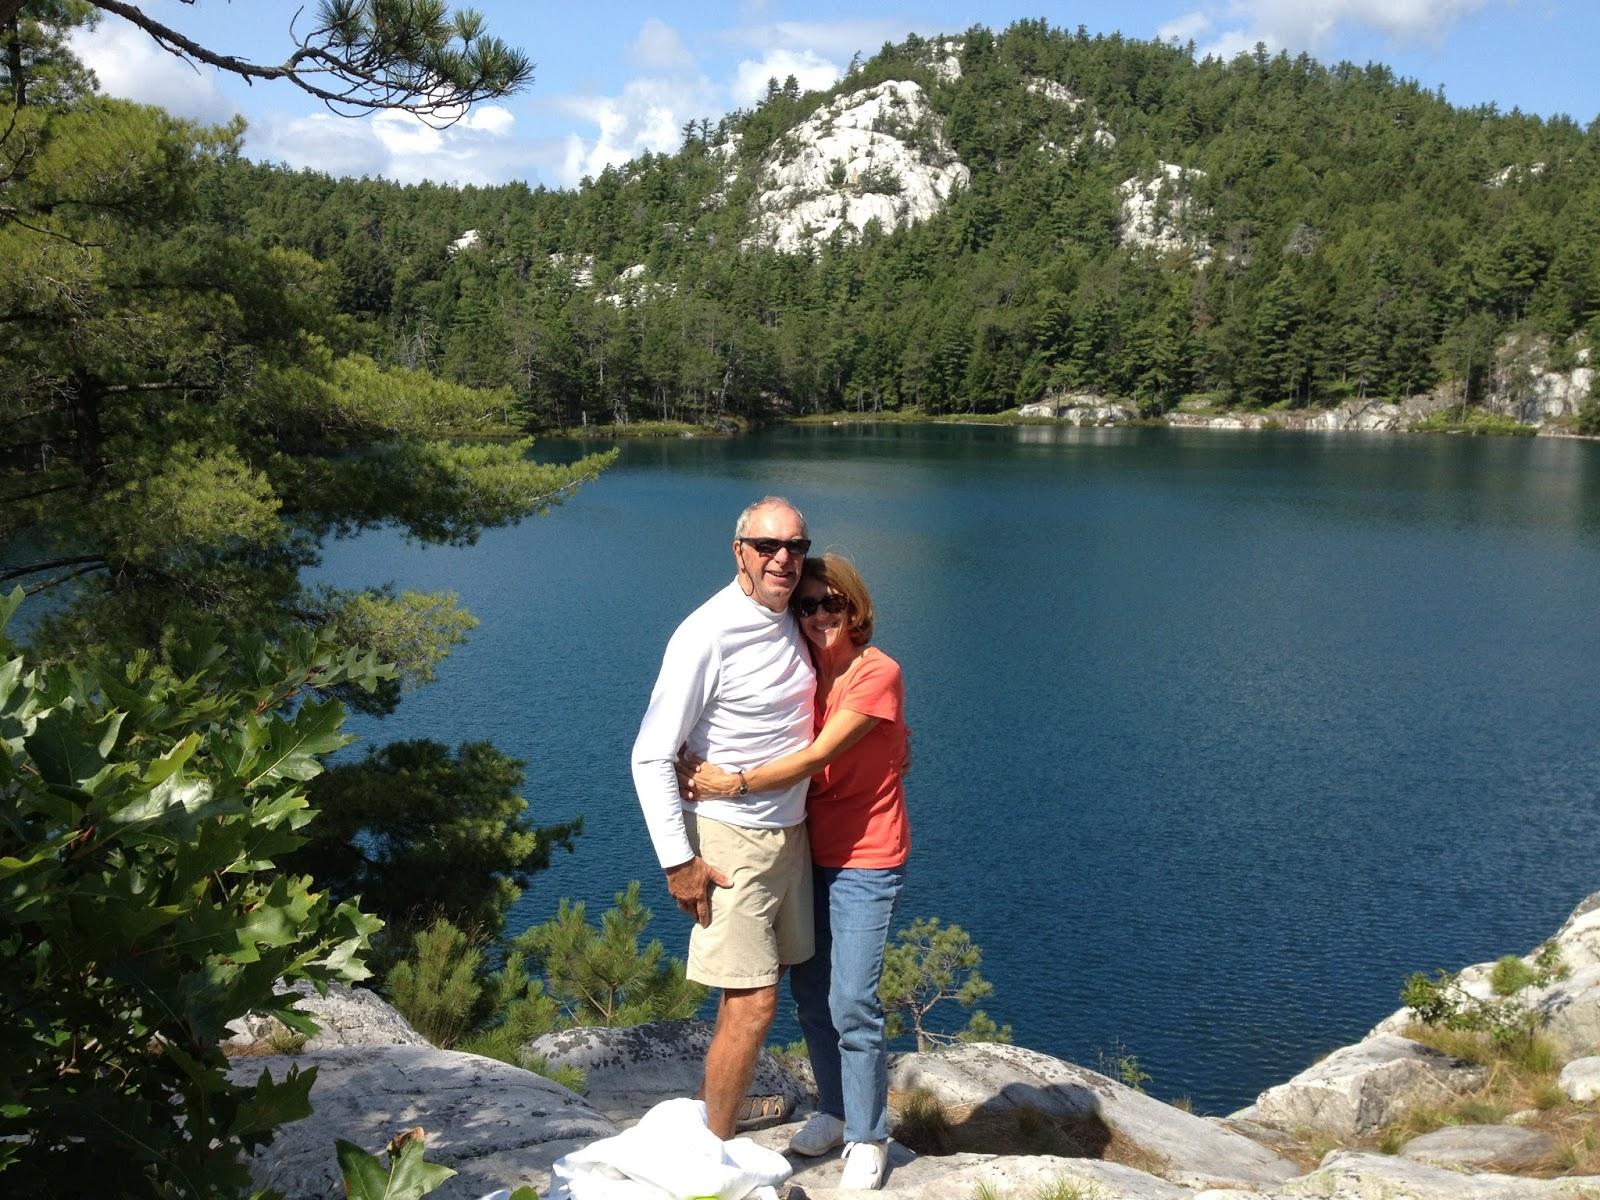 Blewgrass loopers for Topaz lake fishing